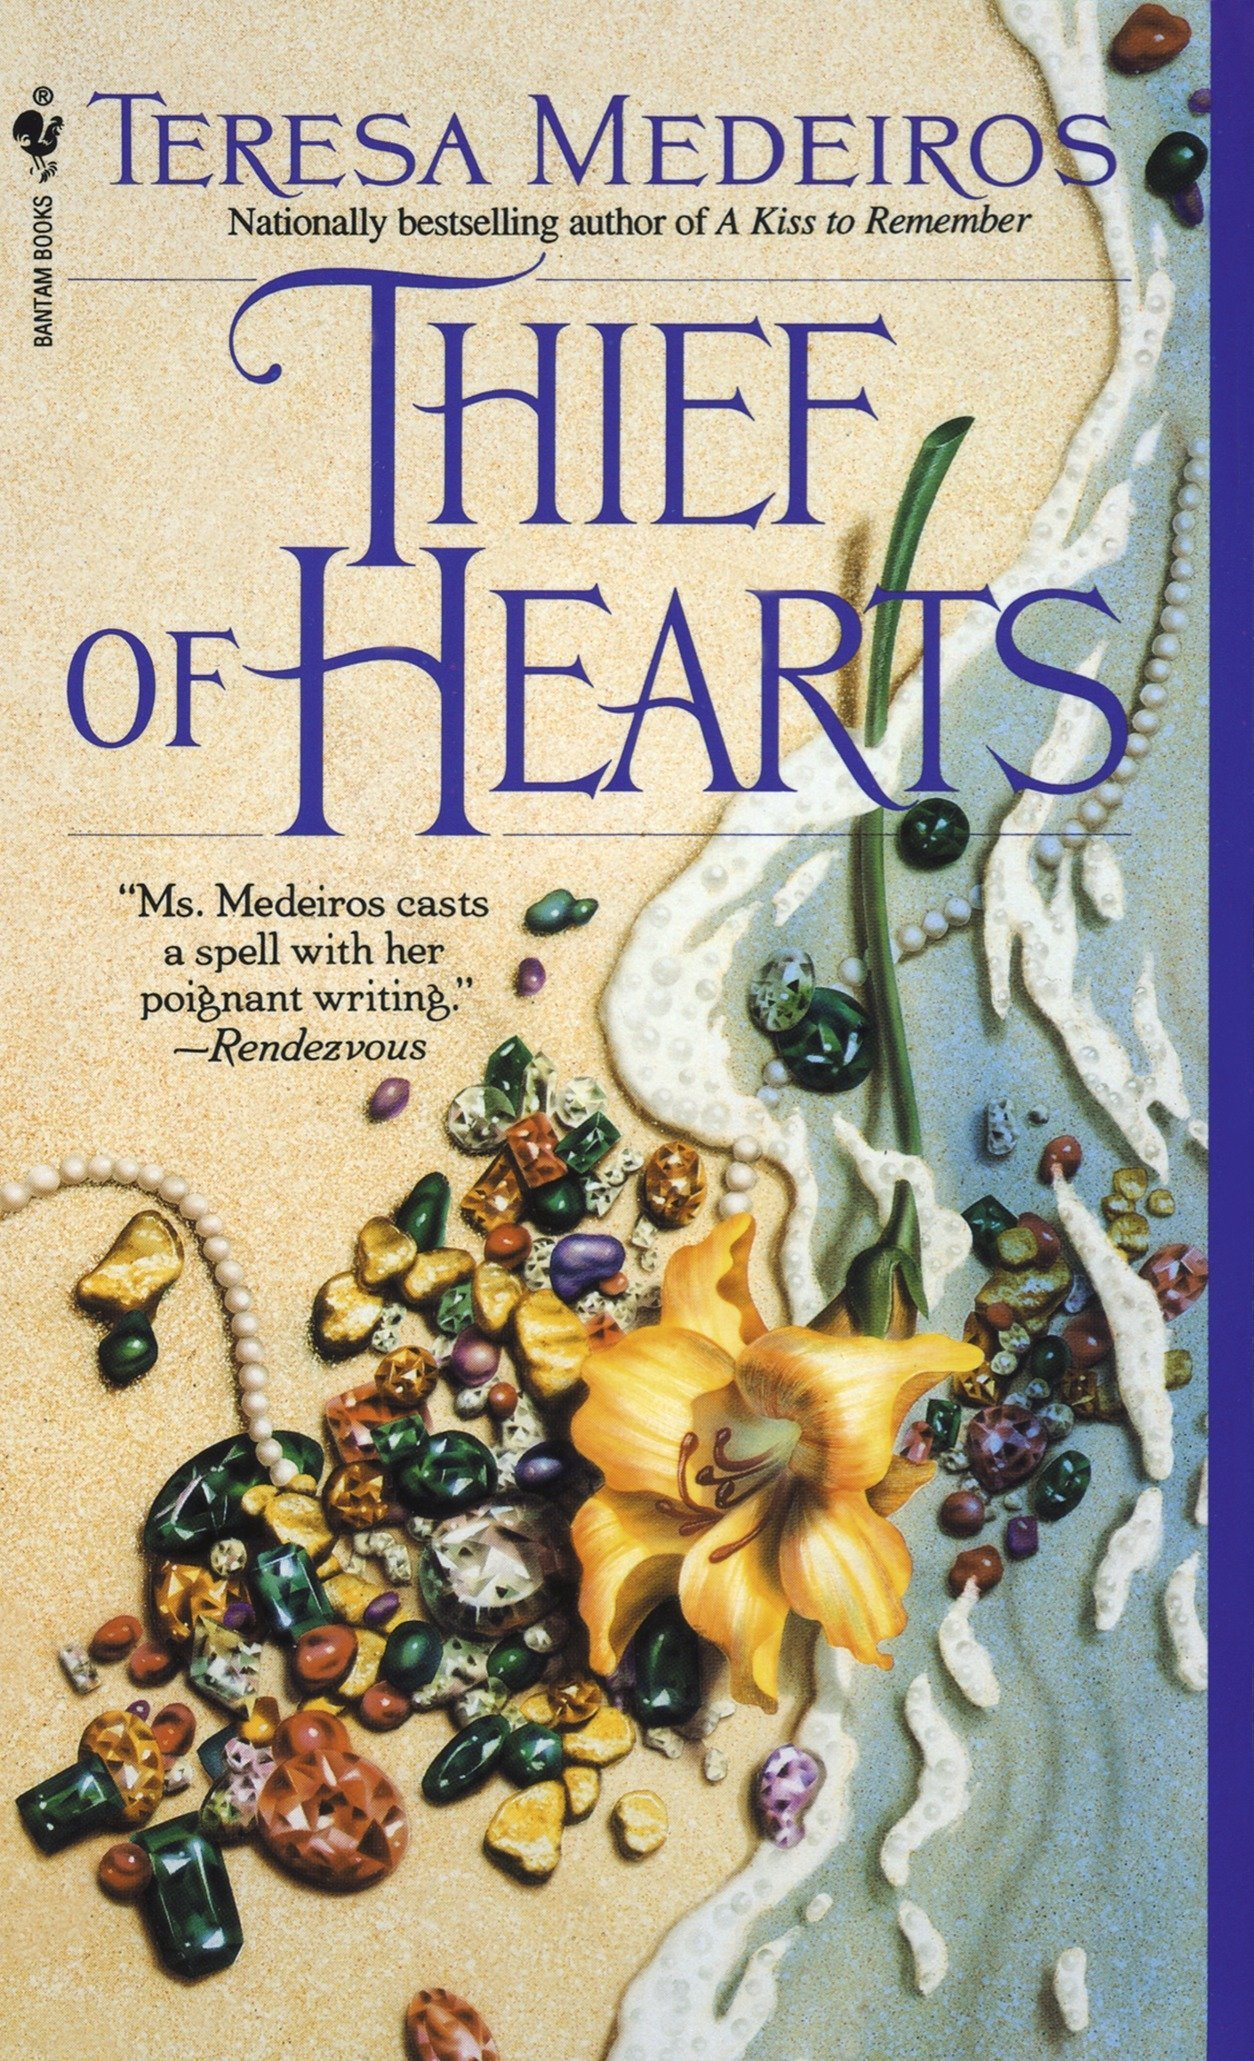 Thief of Hearts: A Novel: Teresa Medeiros: 9780553563320: Amazon.com: Books